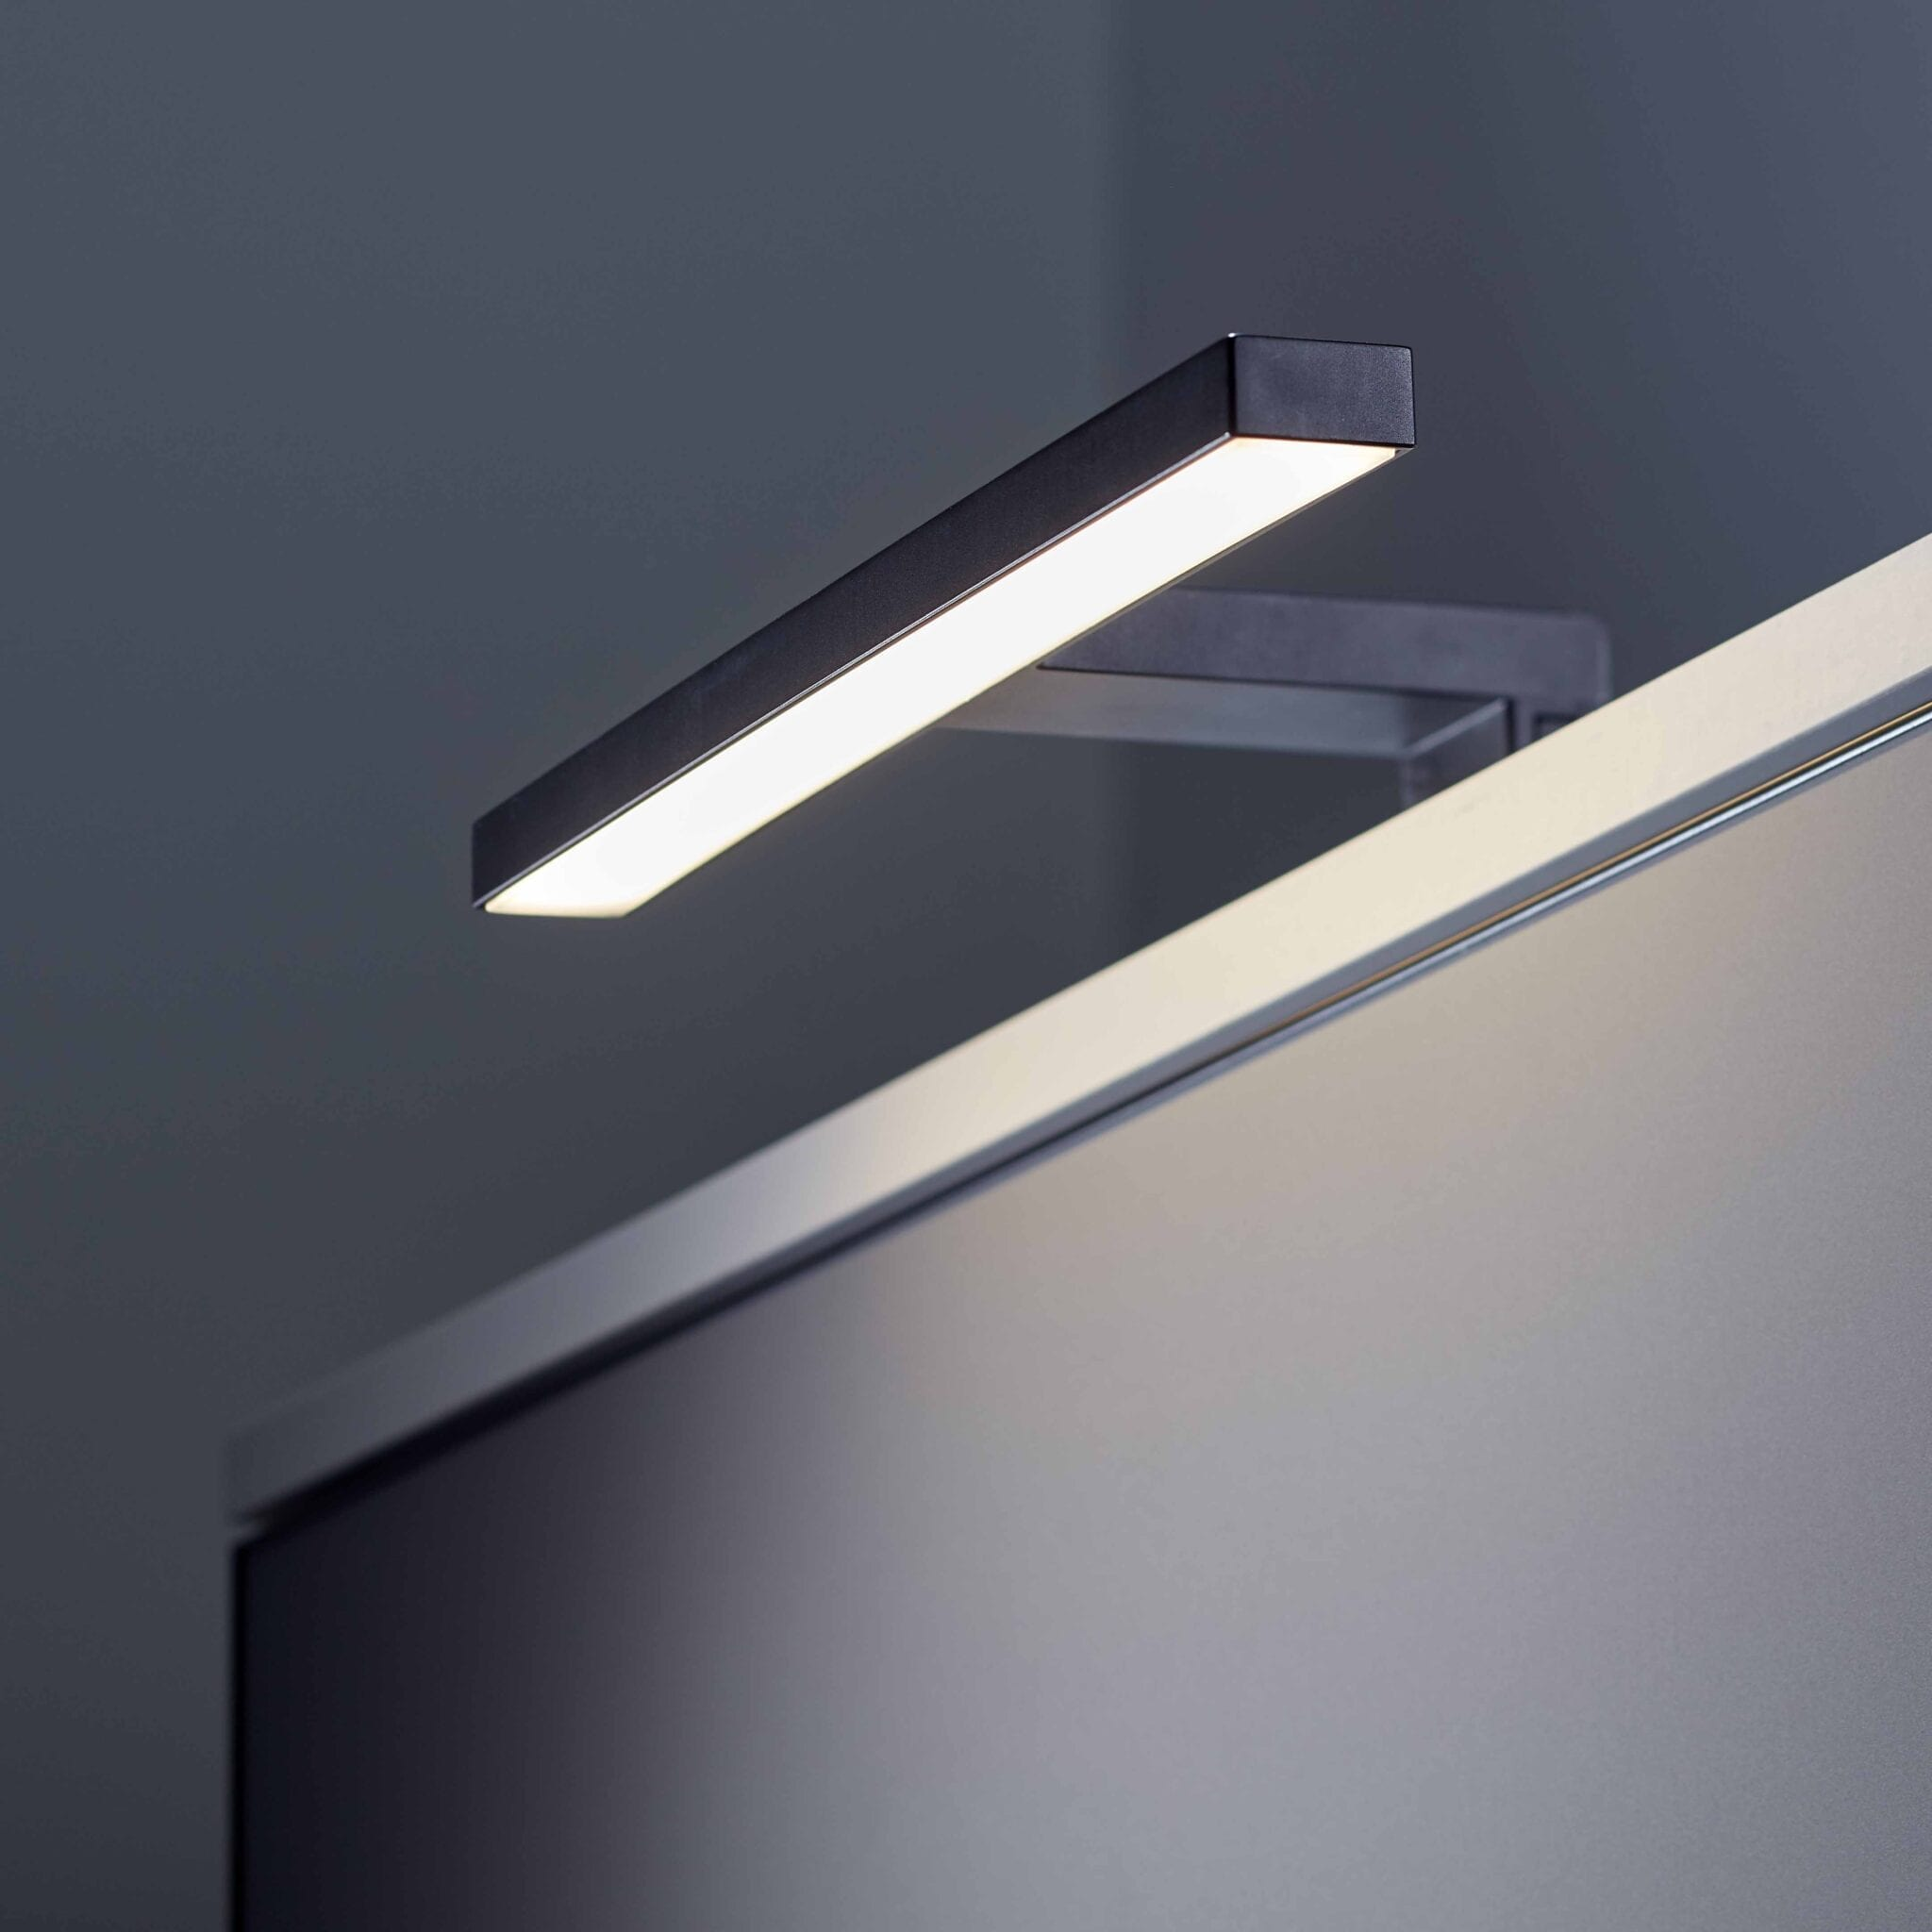 Lagan NextGen LED Speillampe Sort 300mm 4,4W